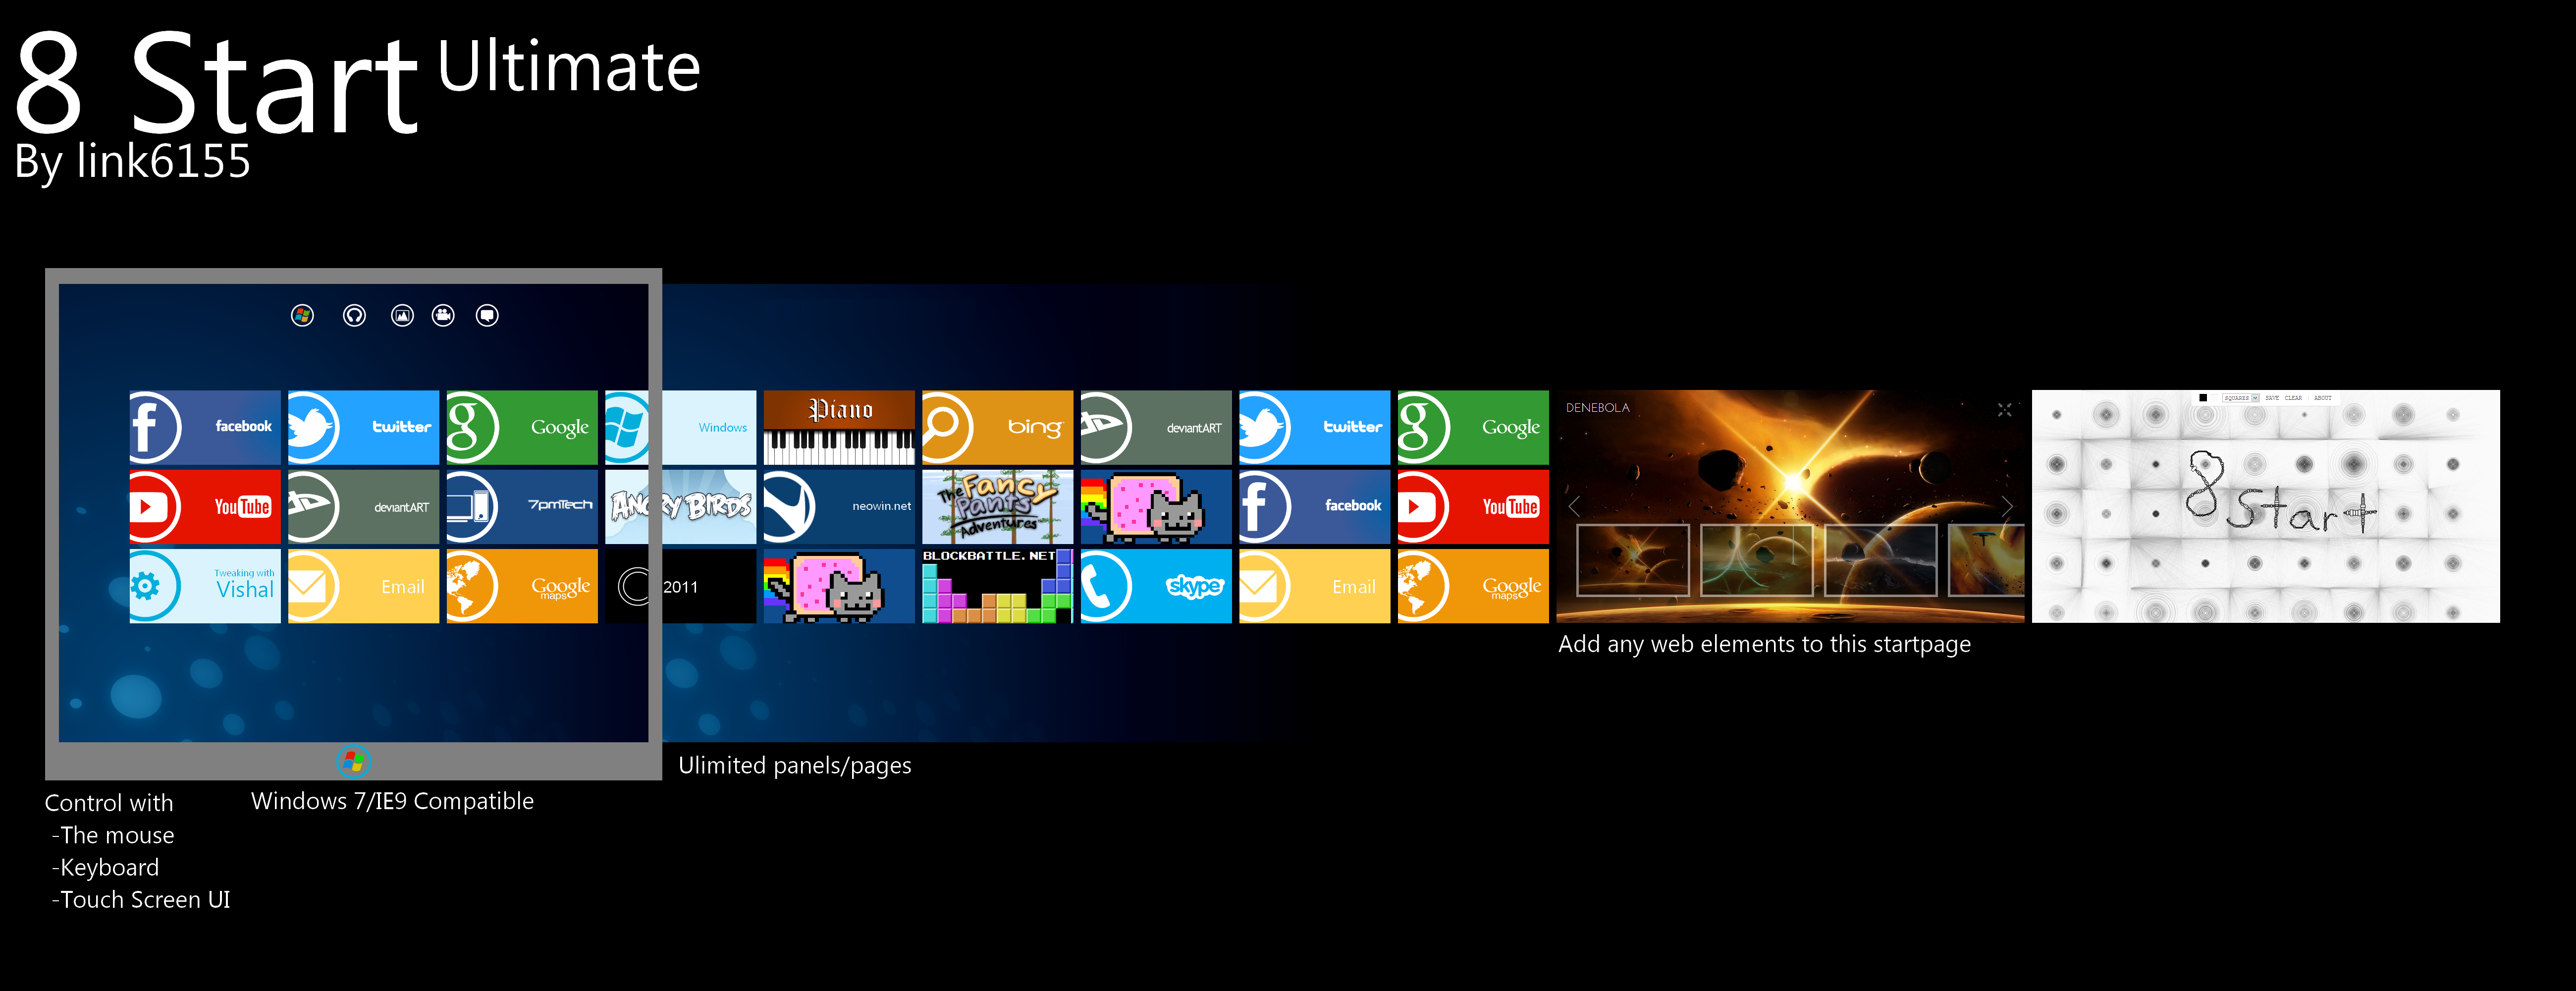 Alma Mater.: Windows 8 concept